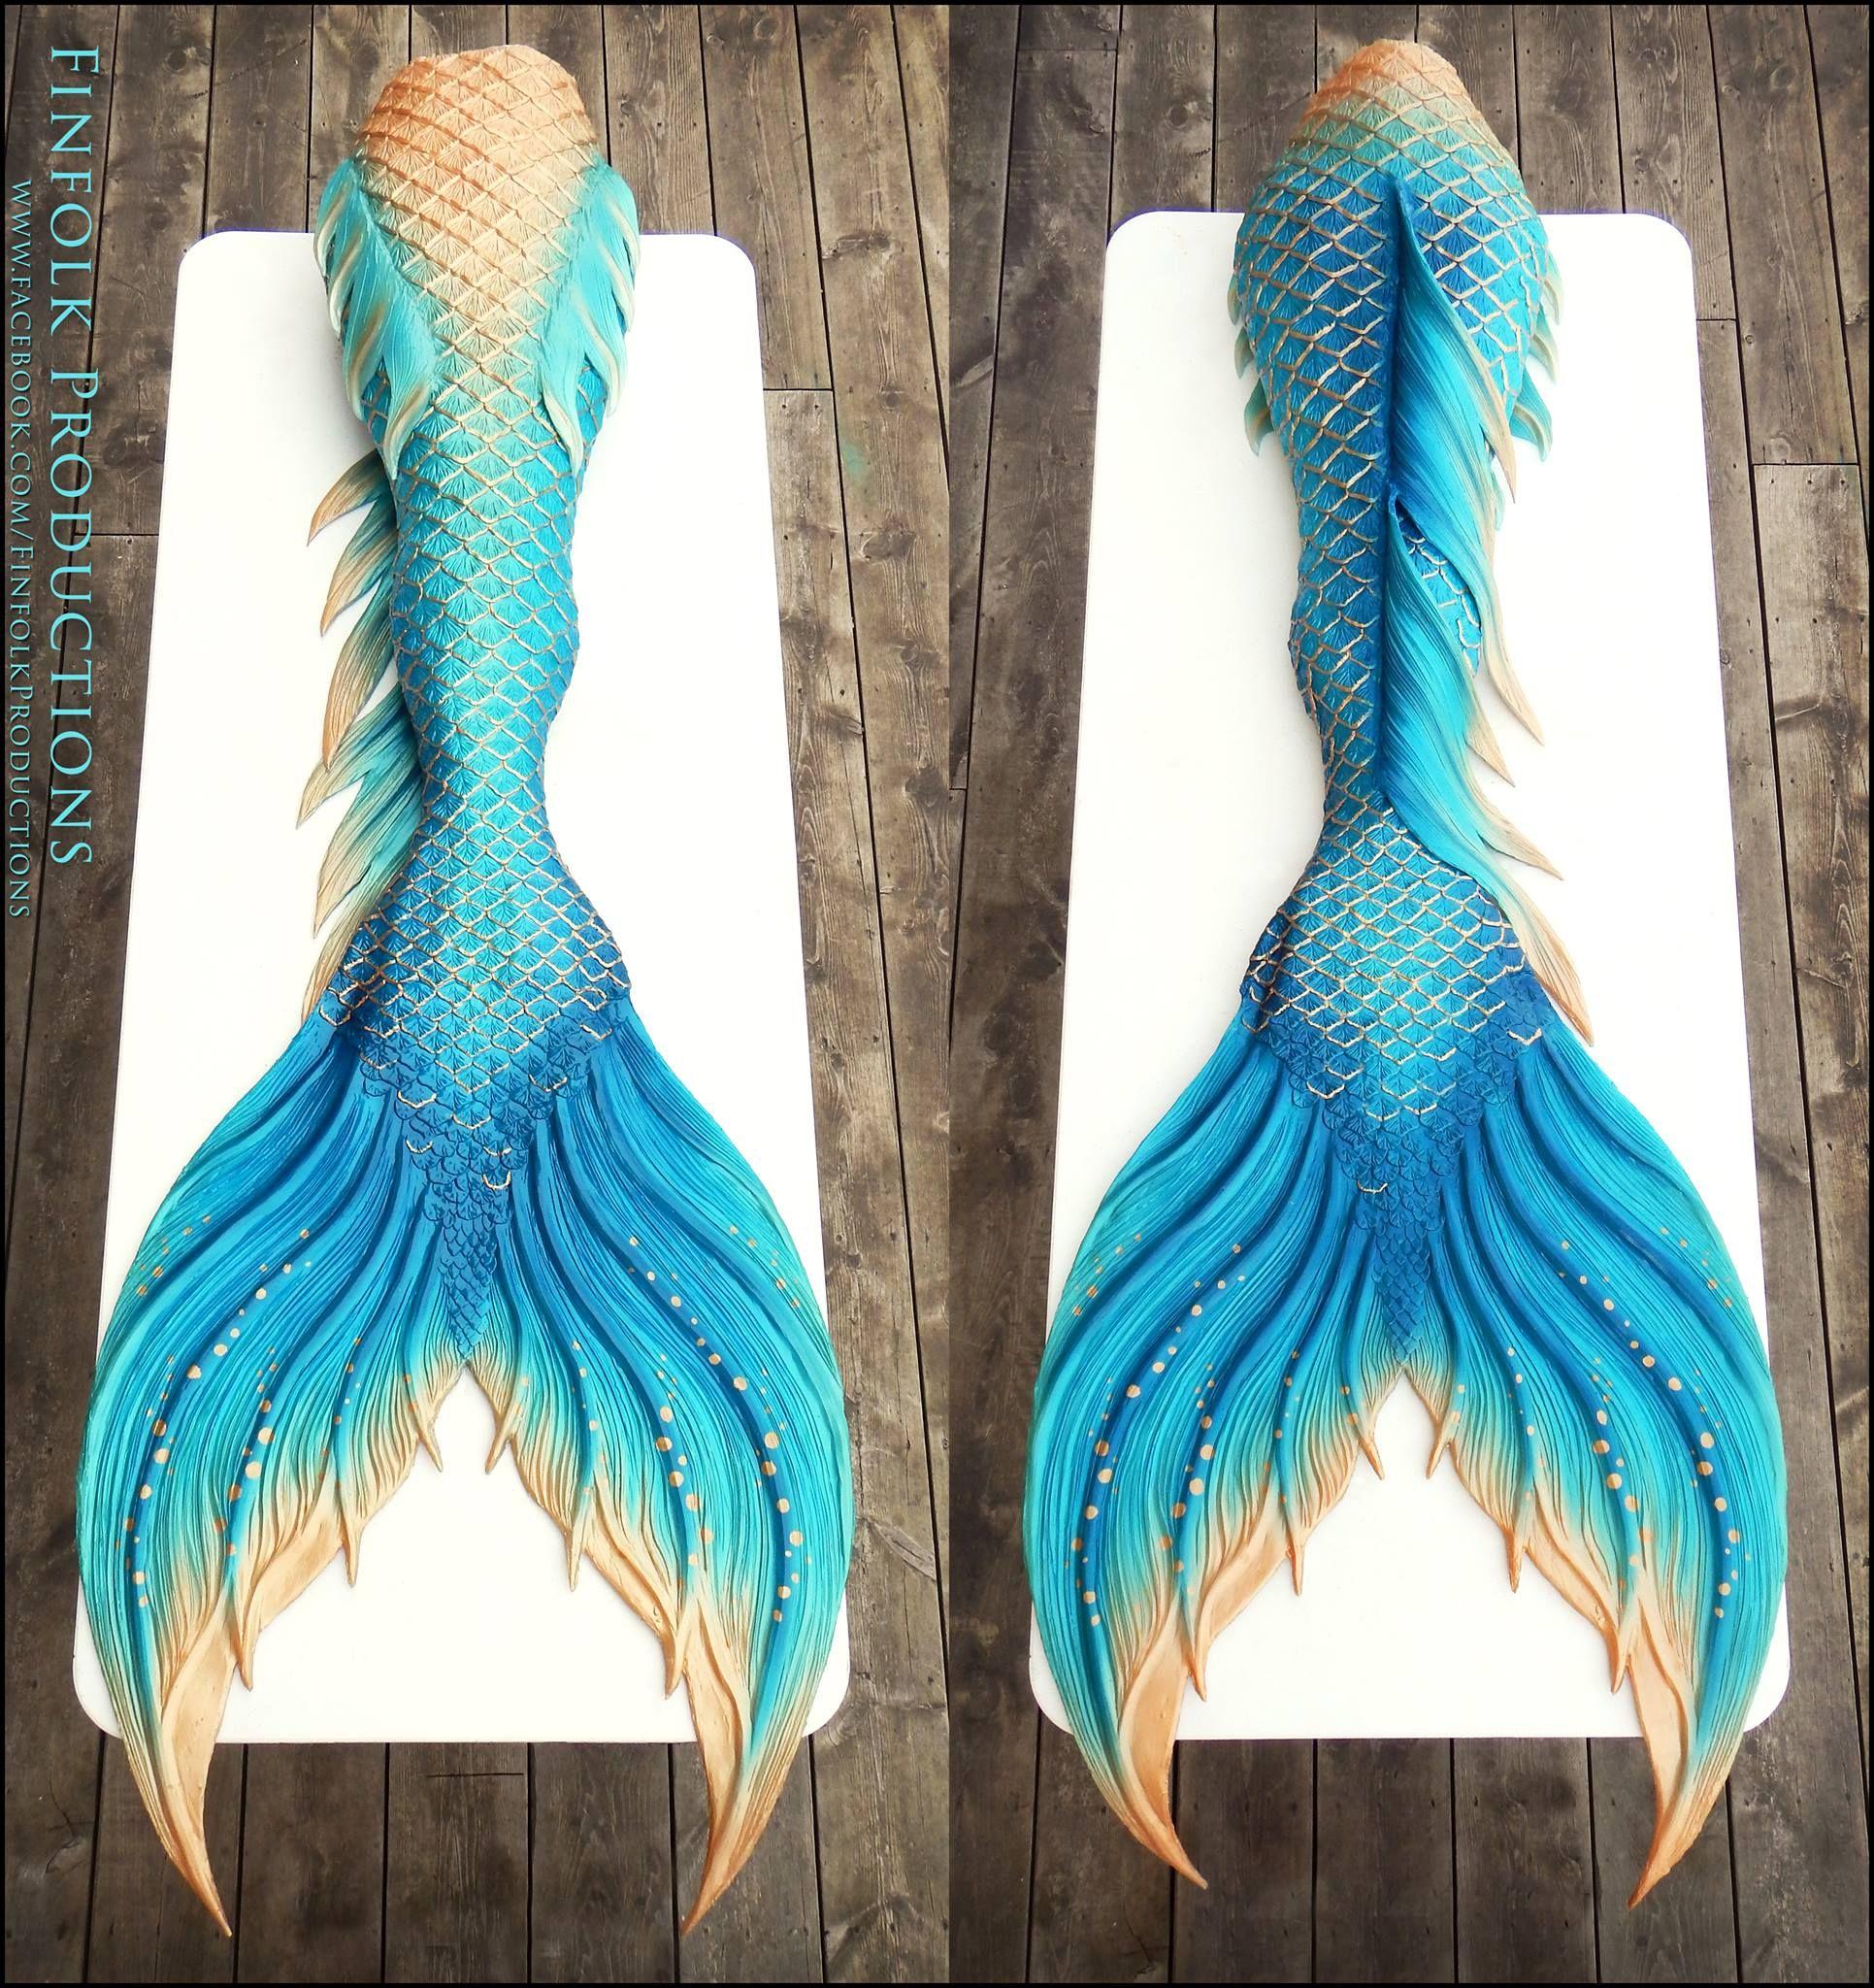 Finfolk | Mermaid Tail Collection | Page 5 | Mermaids ...  Finfolk | Merma...